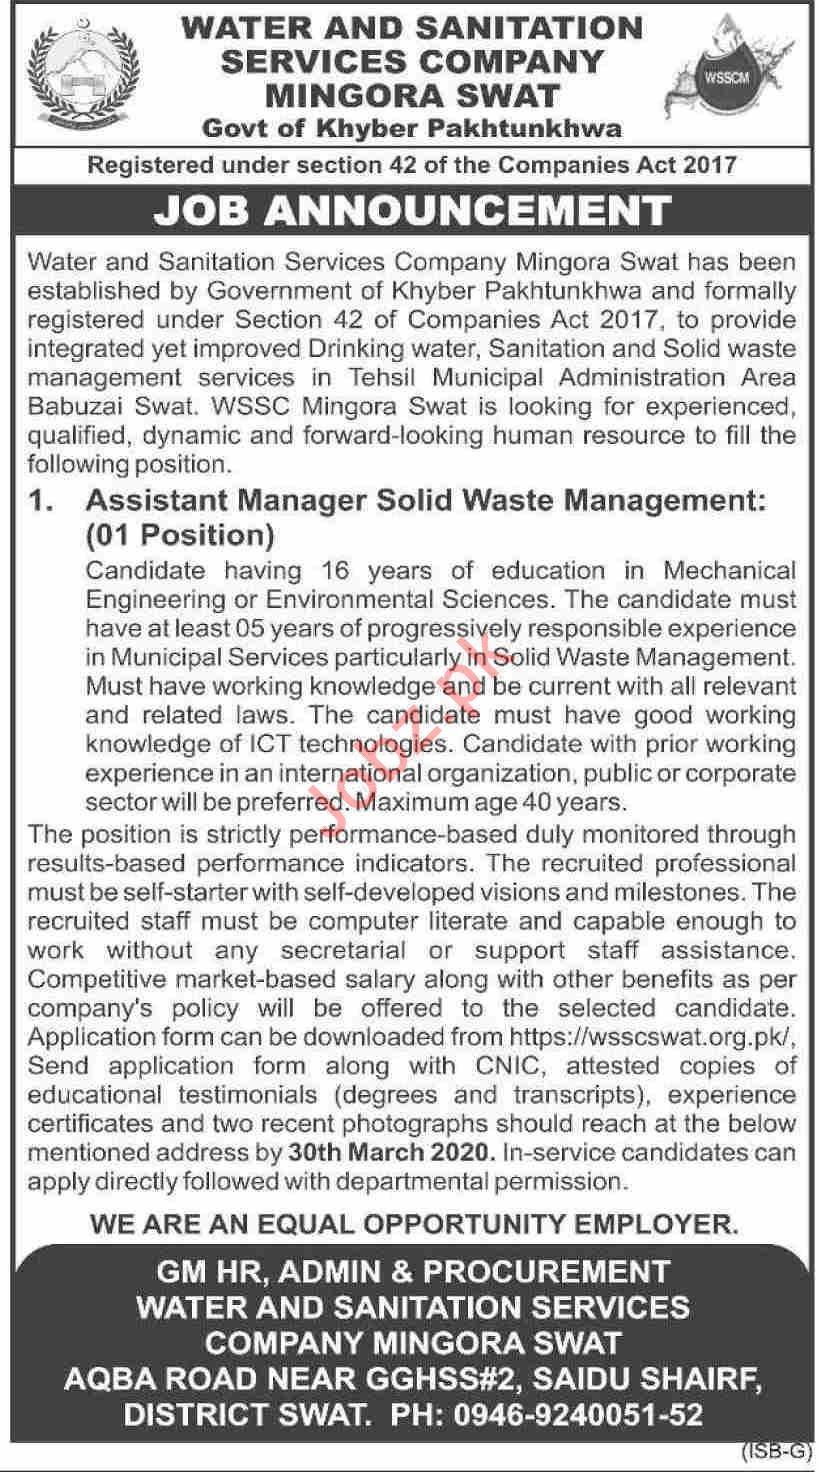 Water & Sanitation Services Company WSSC Mingora Swat Jobs